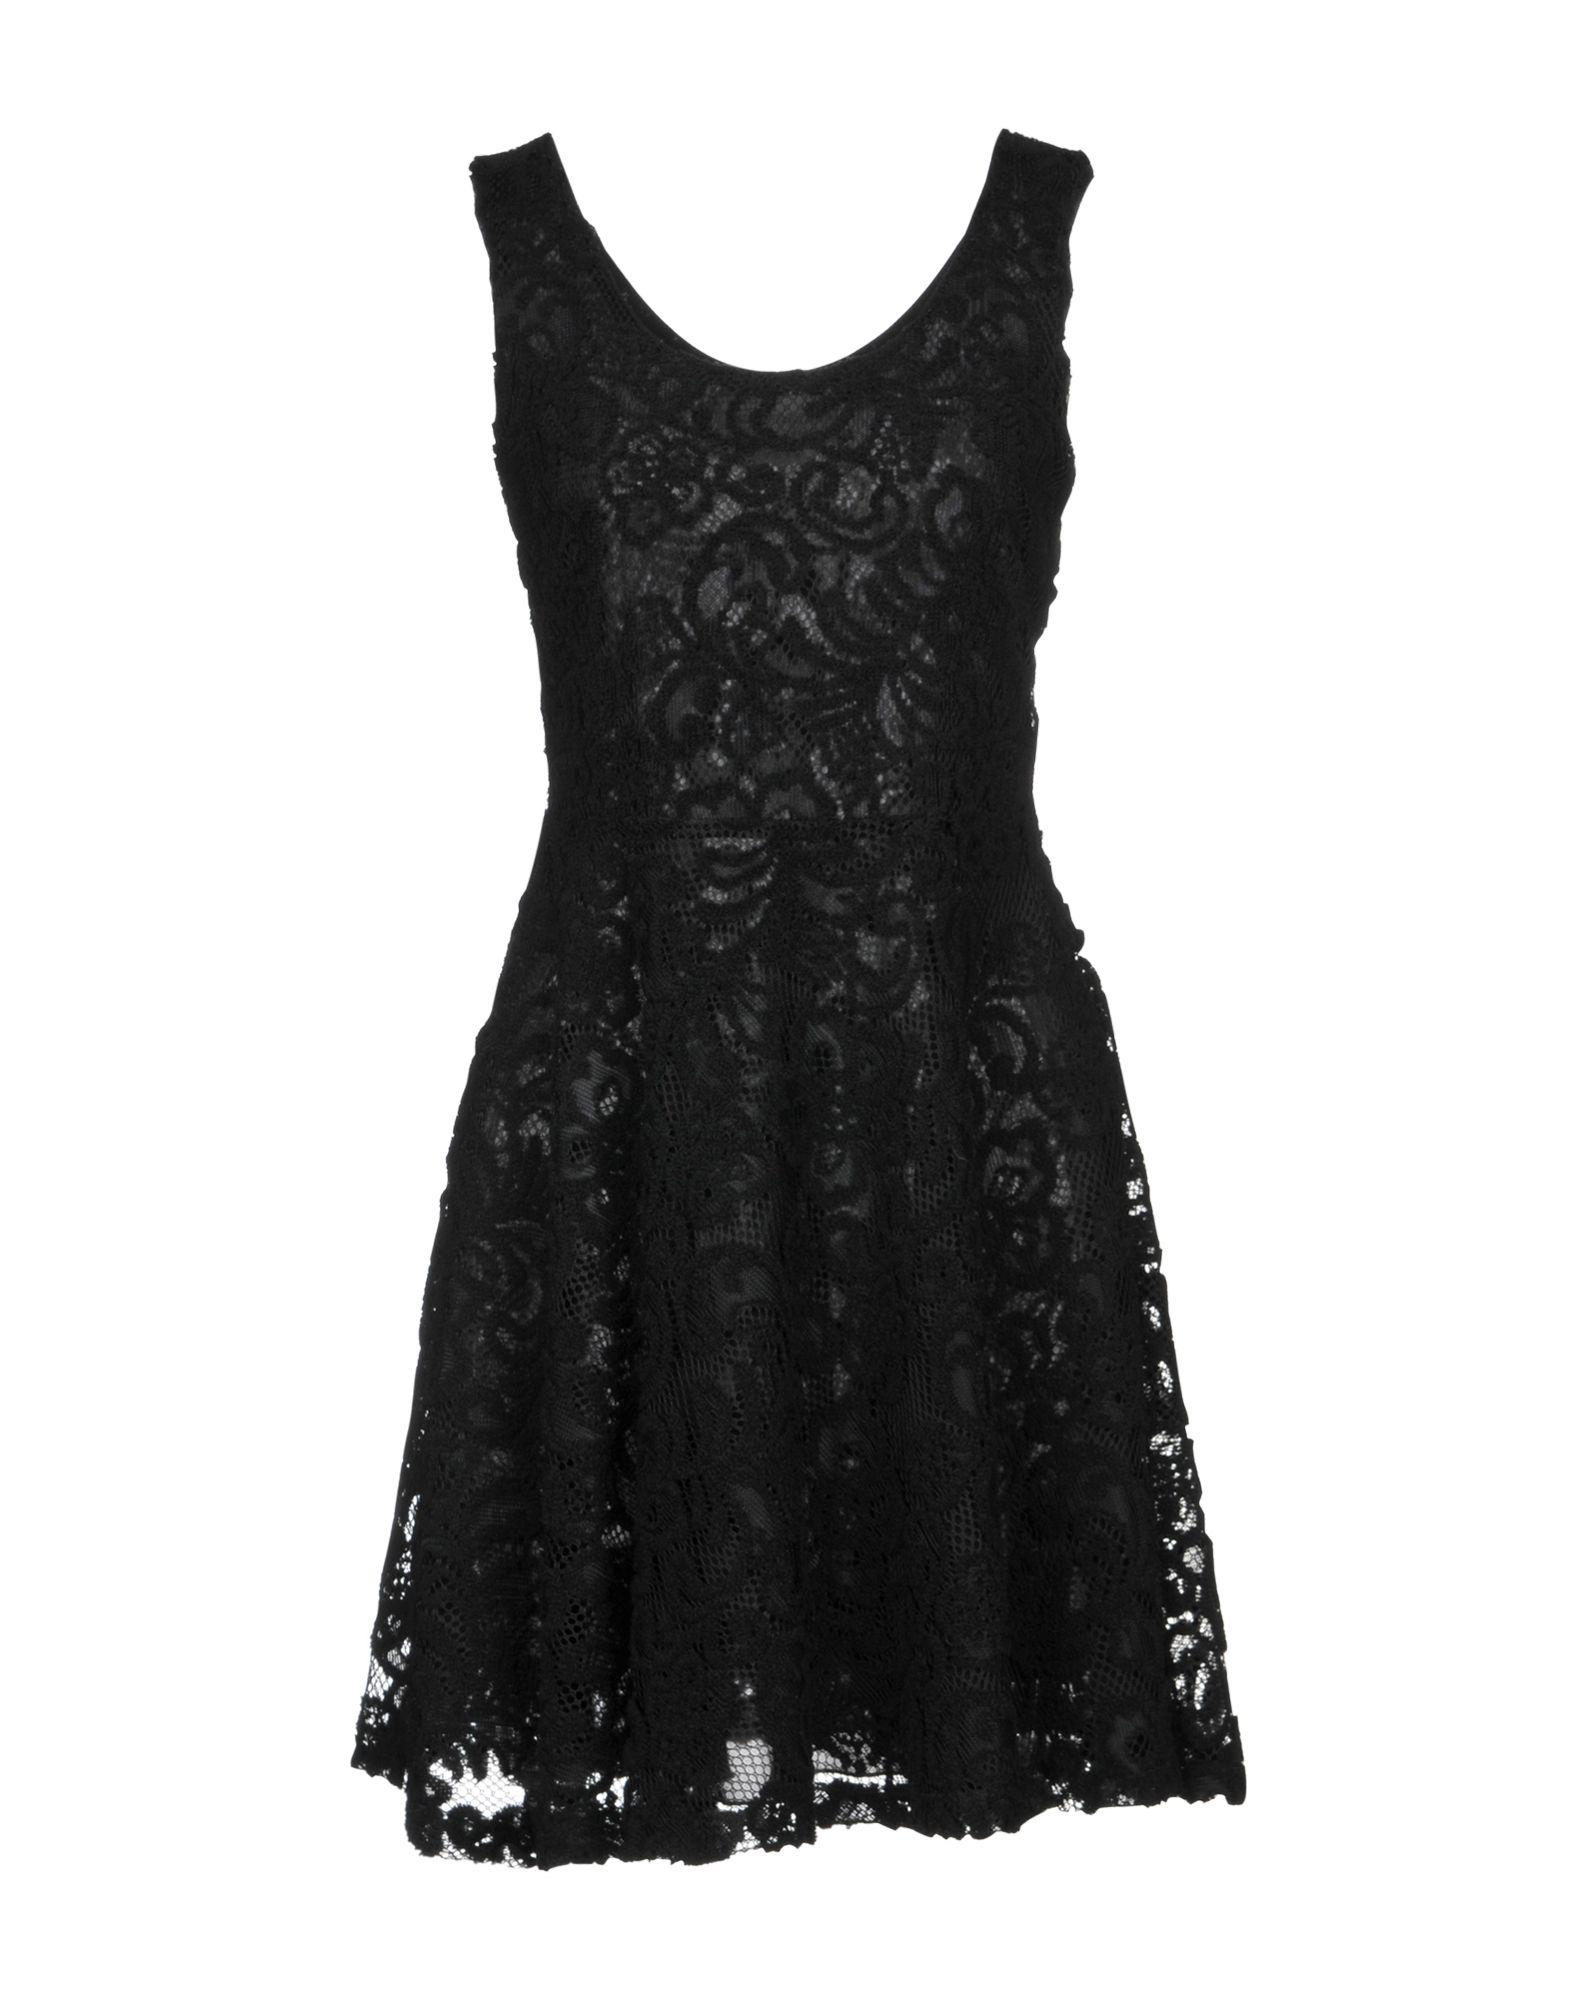 VITTORIAGIRL by VITTORIA ROMANO® Короткое платье vittoria romano платье до колена